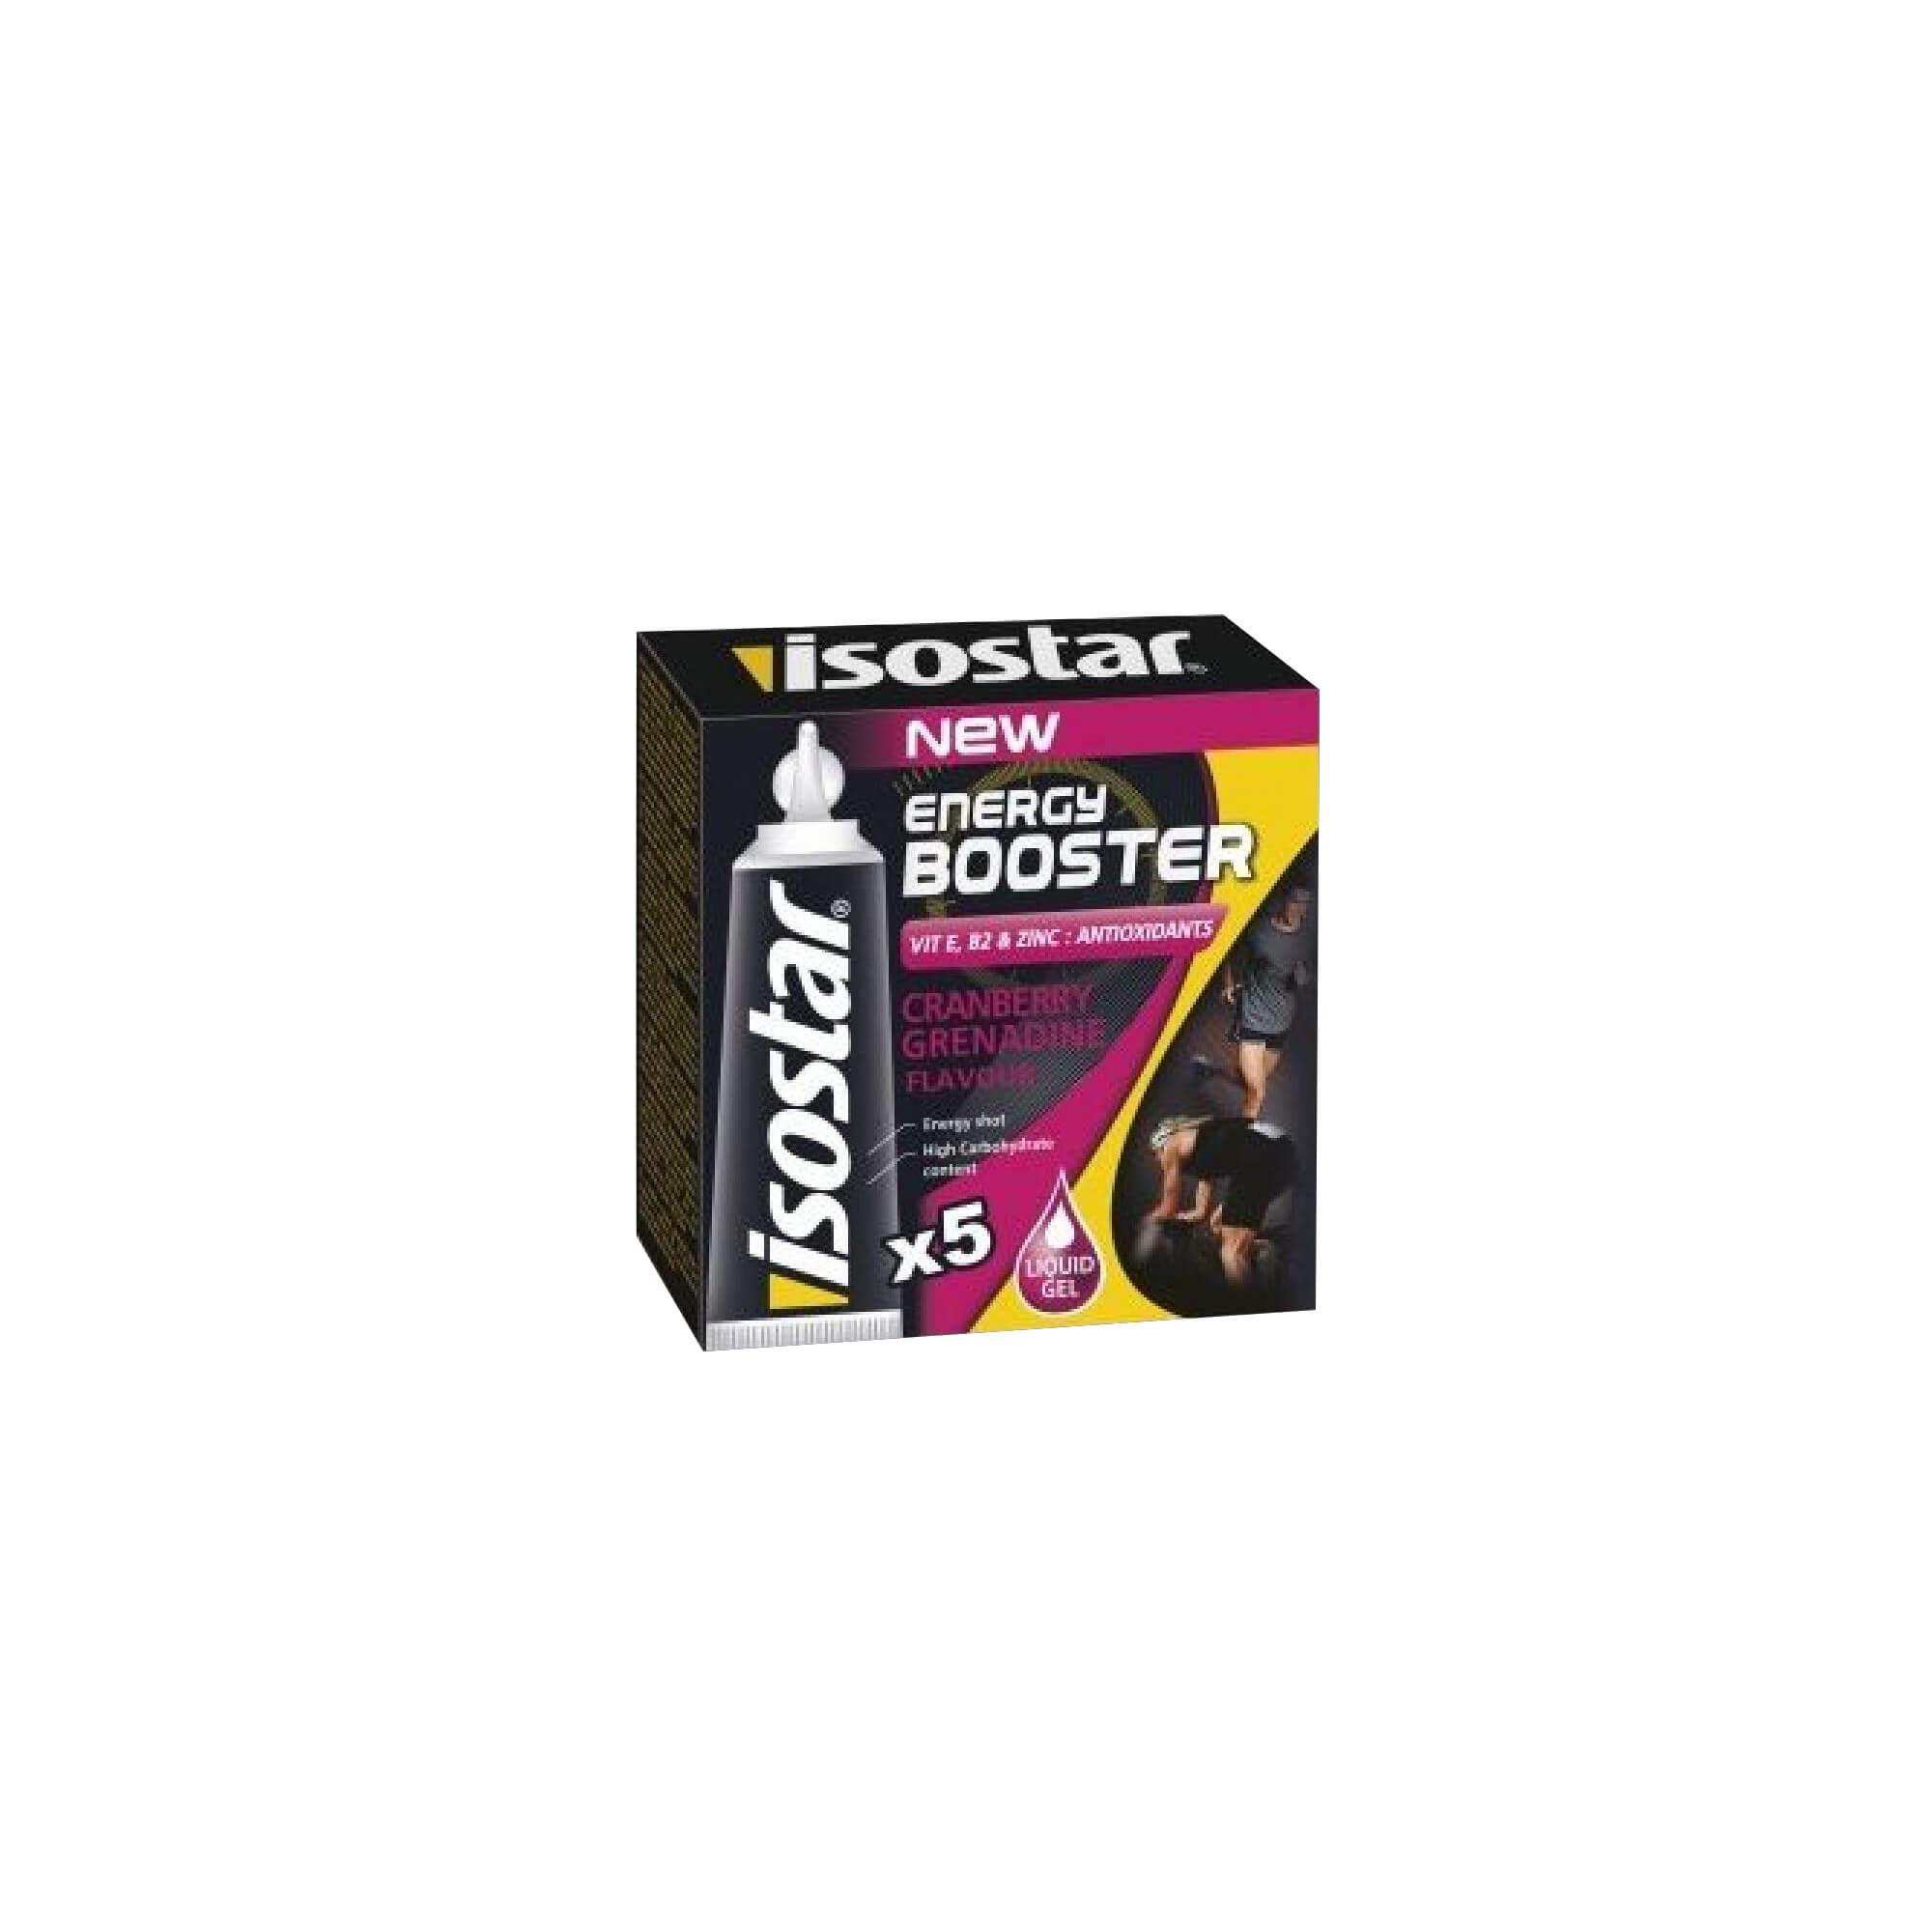 Energy booster antioxidanti de la Isostar